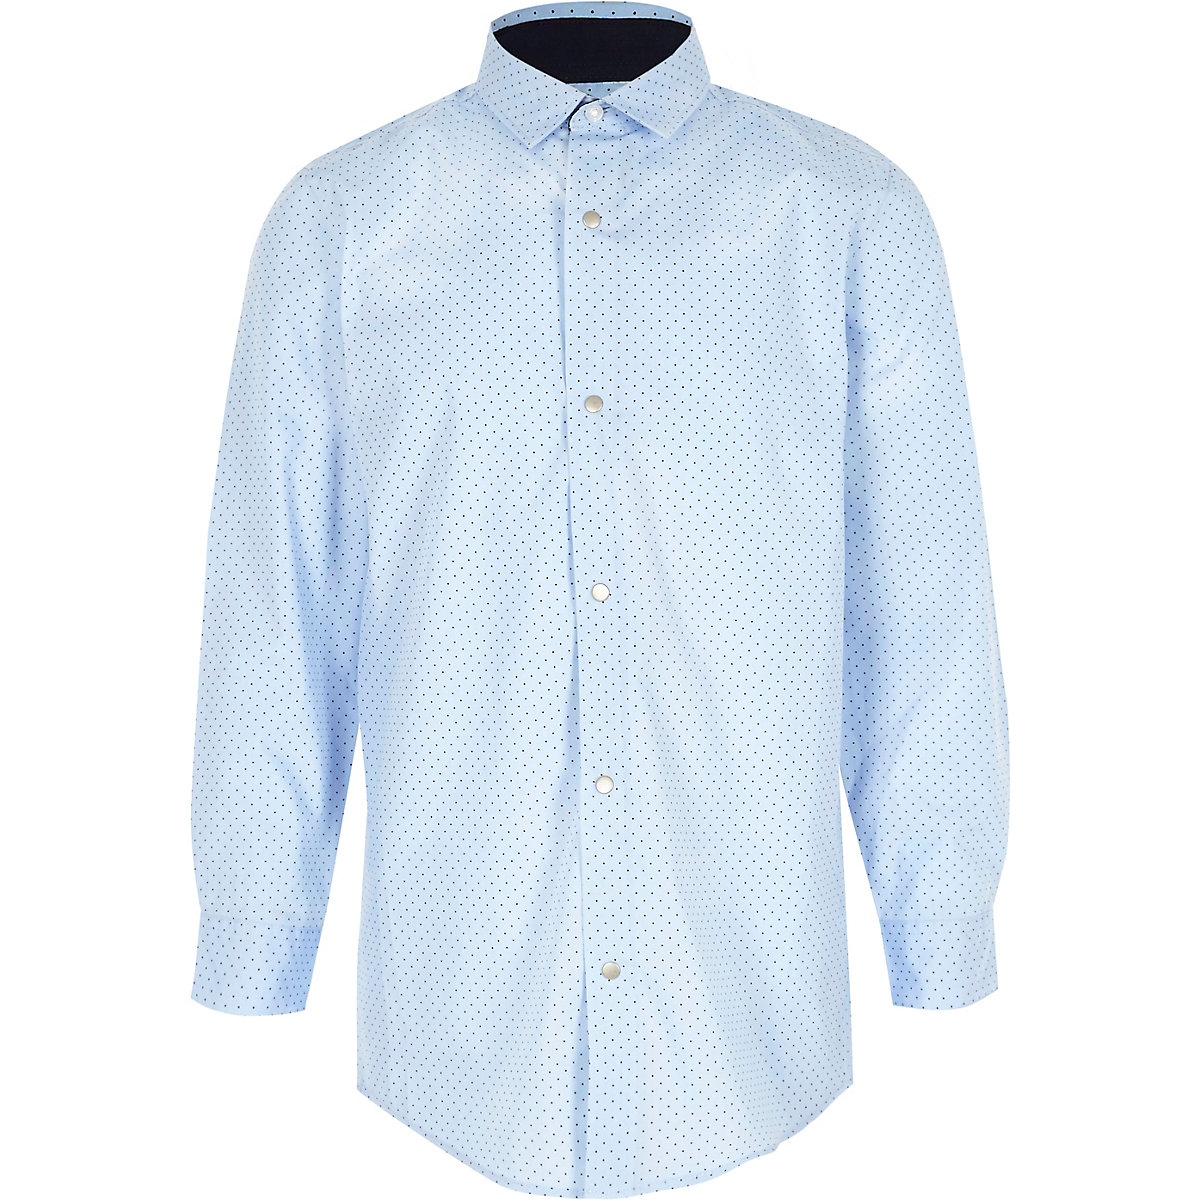 Boys light blue polka dot print shirt